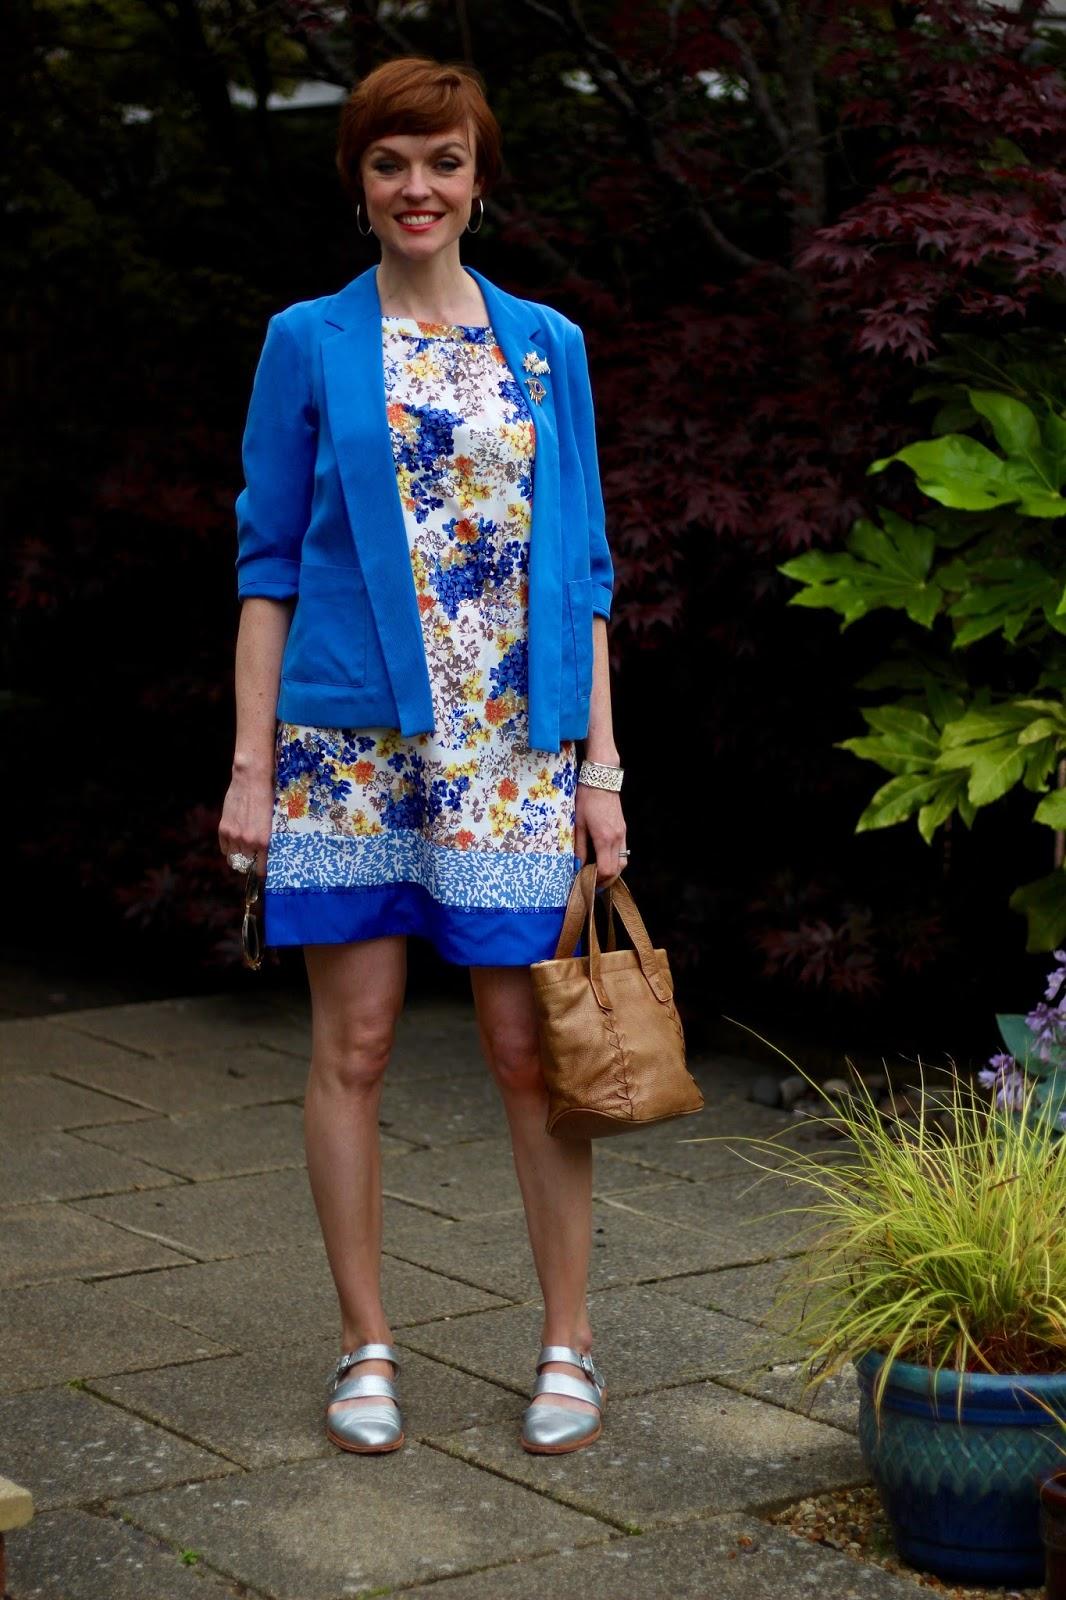 Fake  Fabulous |Wardrobe malfunction, clinging fabrics | Blue, yellow and orange floral dress & silver sandals